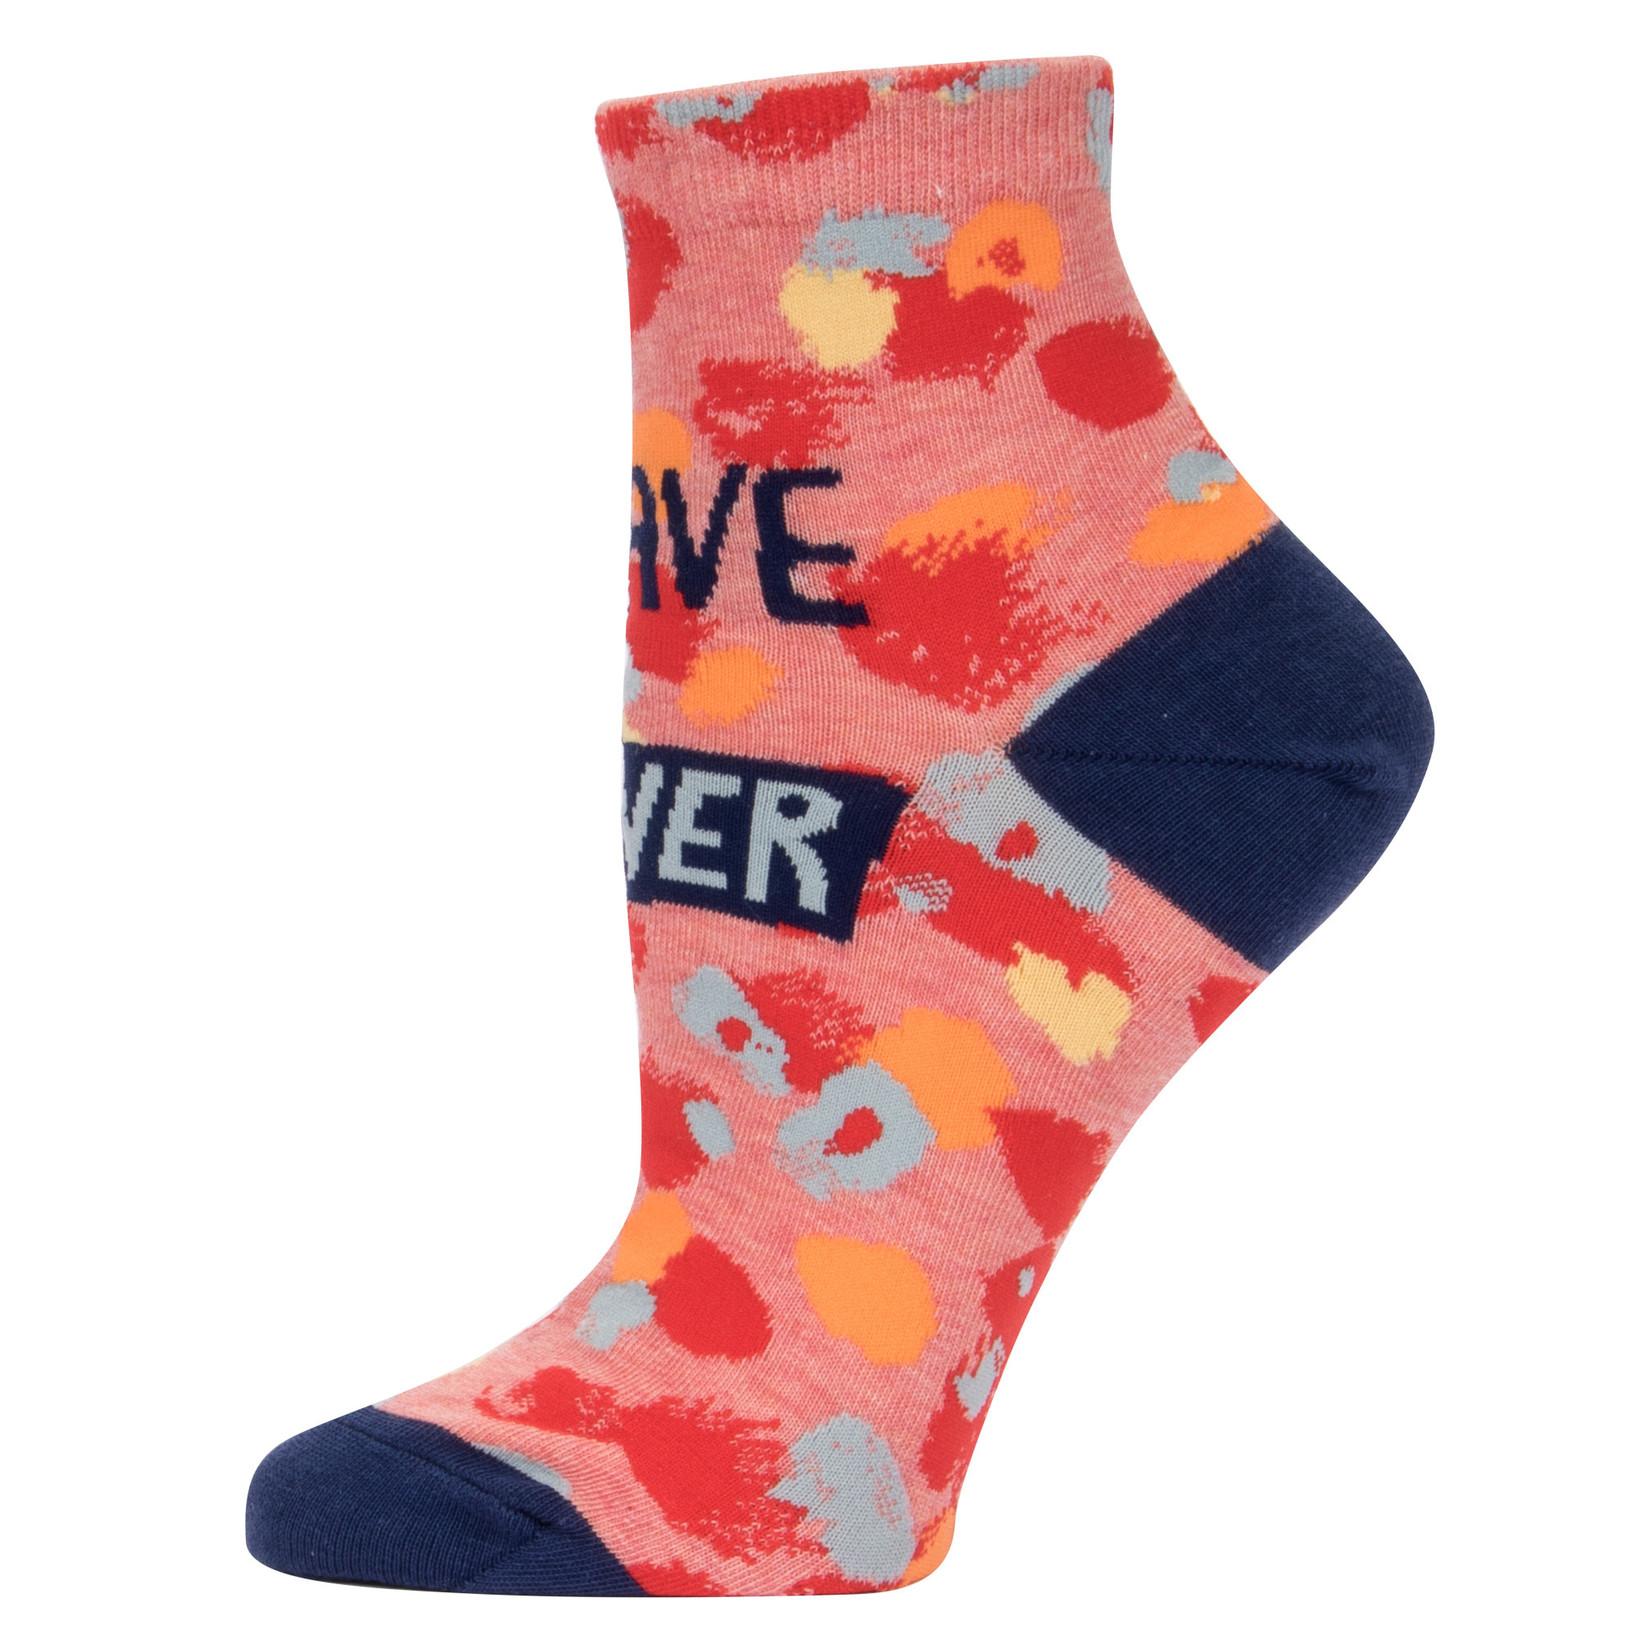 Blue Q Womens Ankle Socks - I'll Behave Never